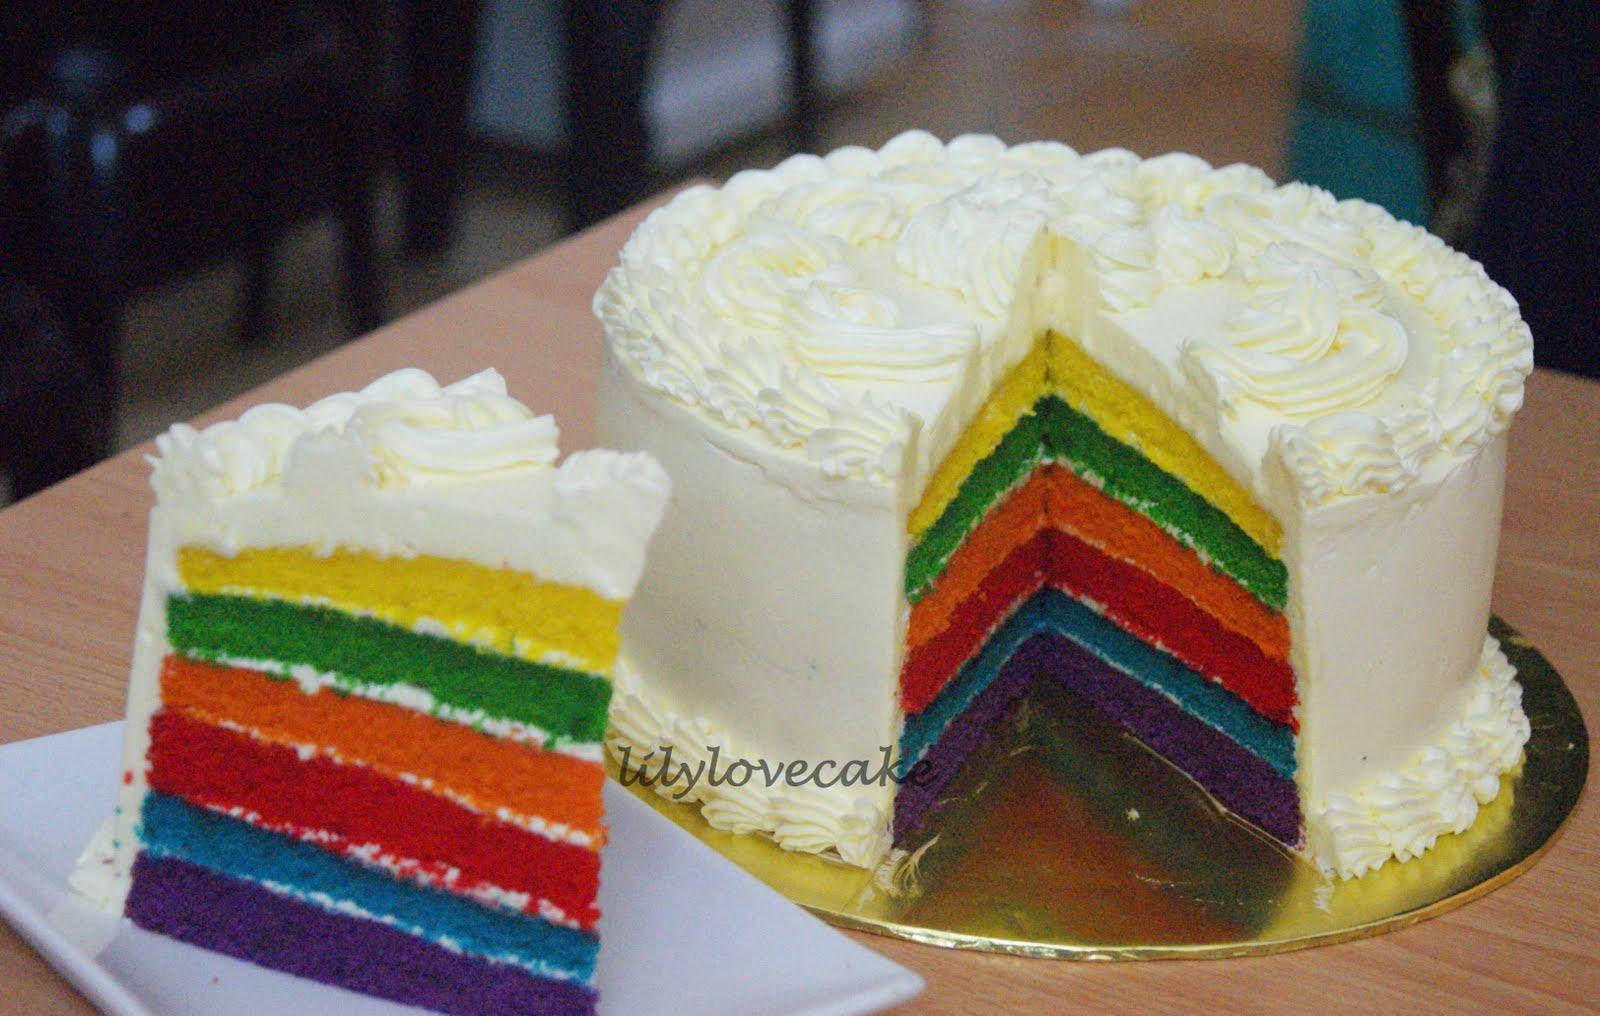 Continental Cake range